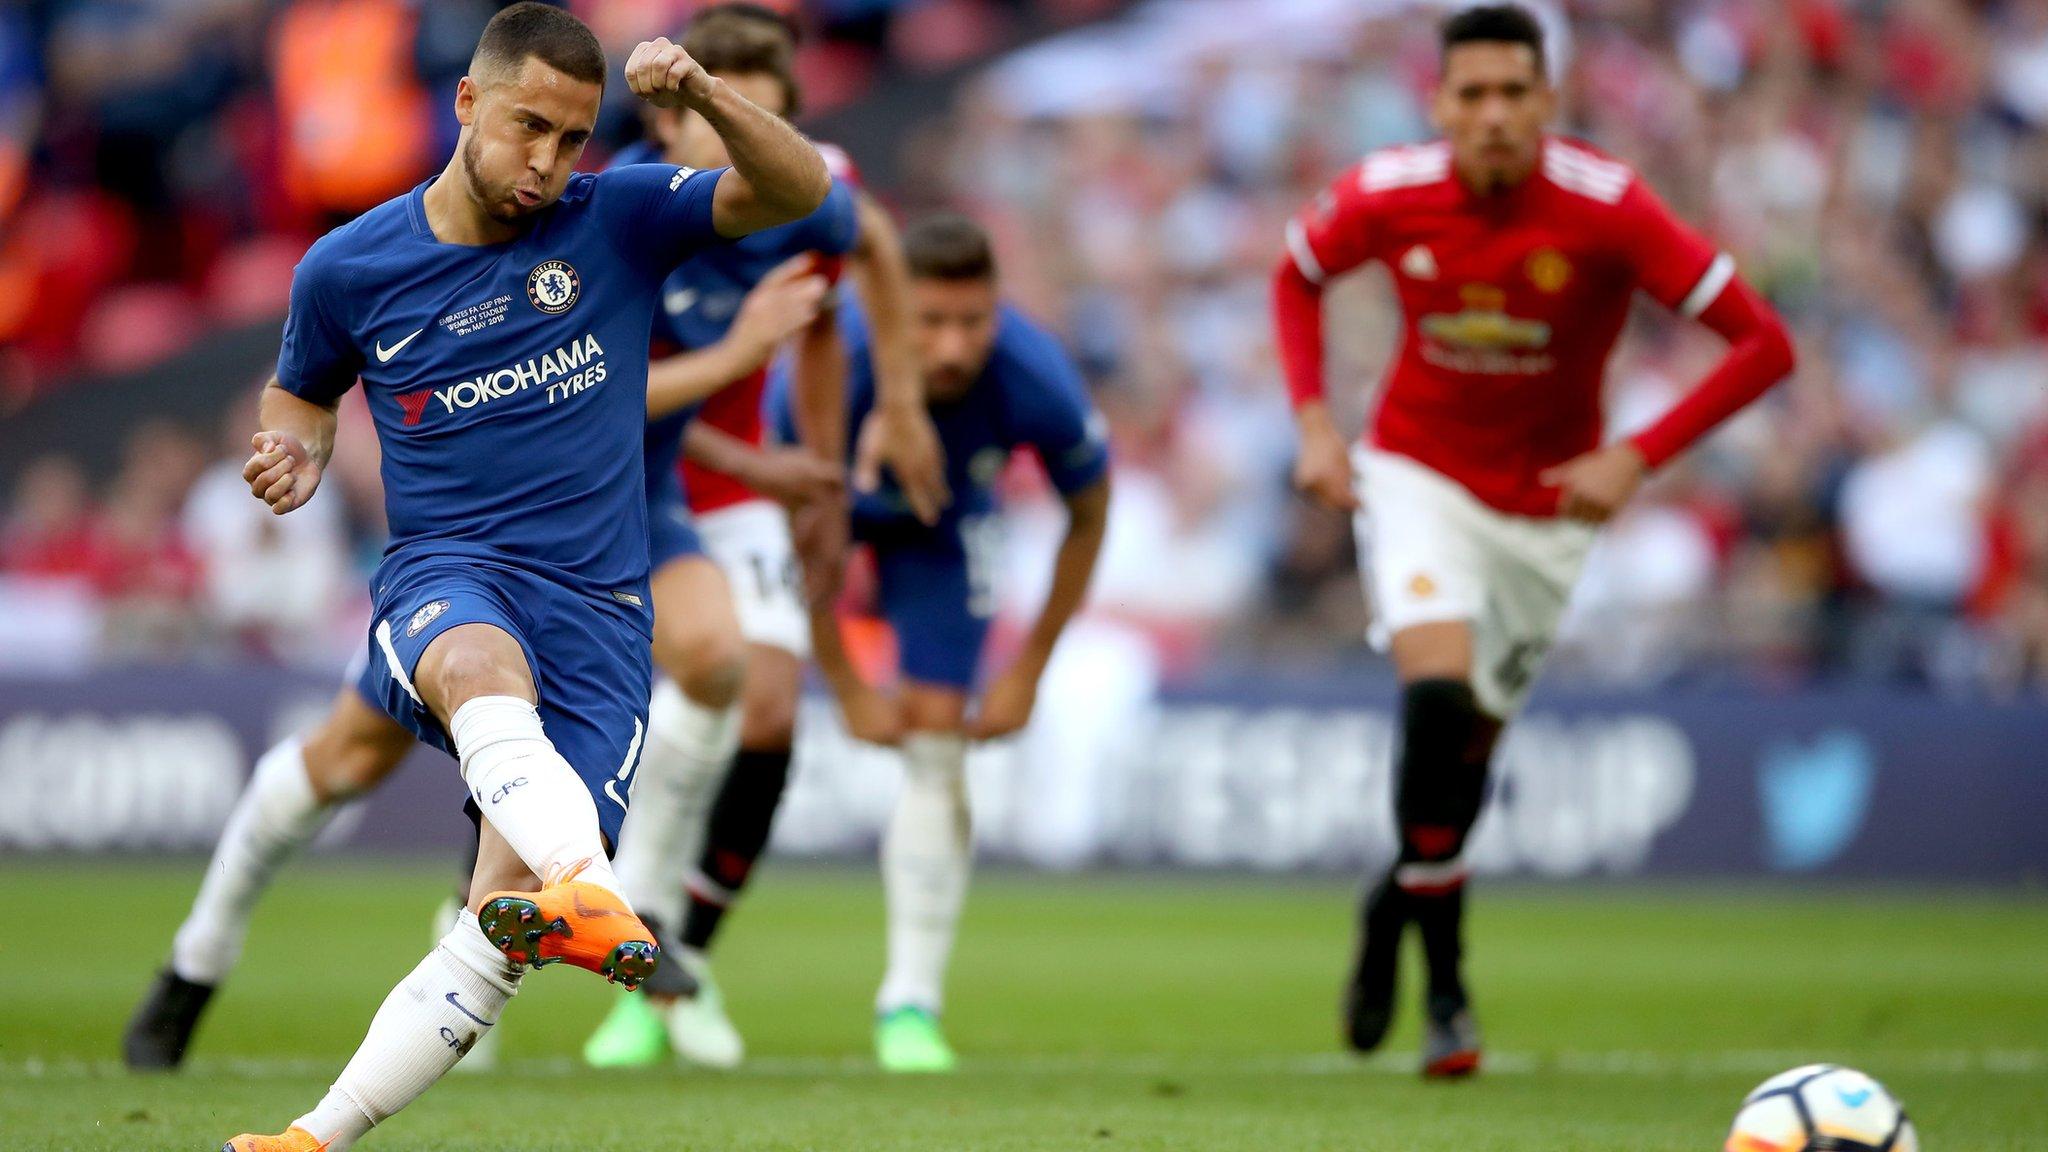 FA Cup final: Chelsea's Eden Hazard scores the winning goal v Man Utd